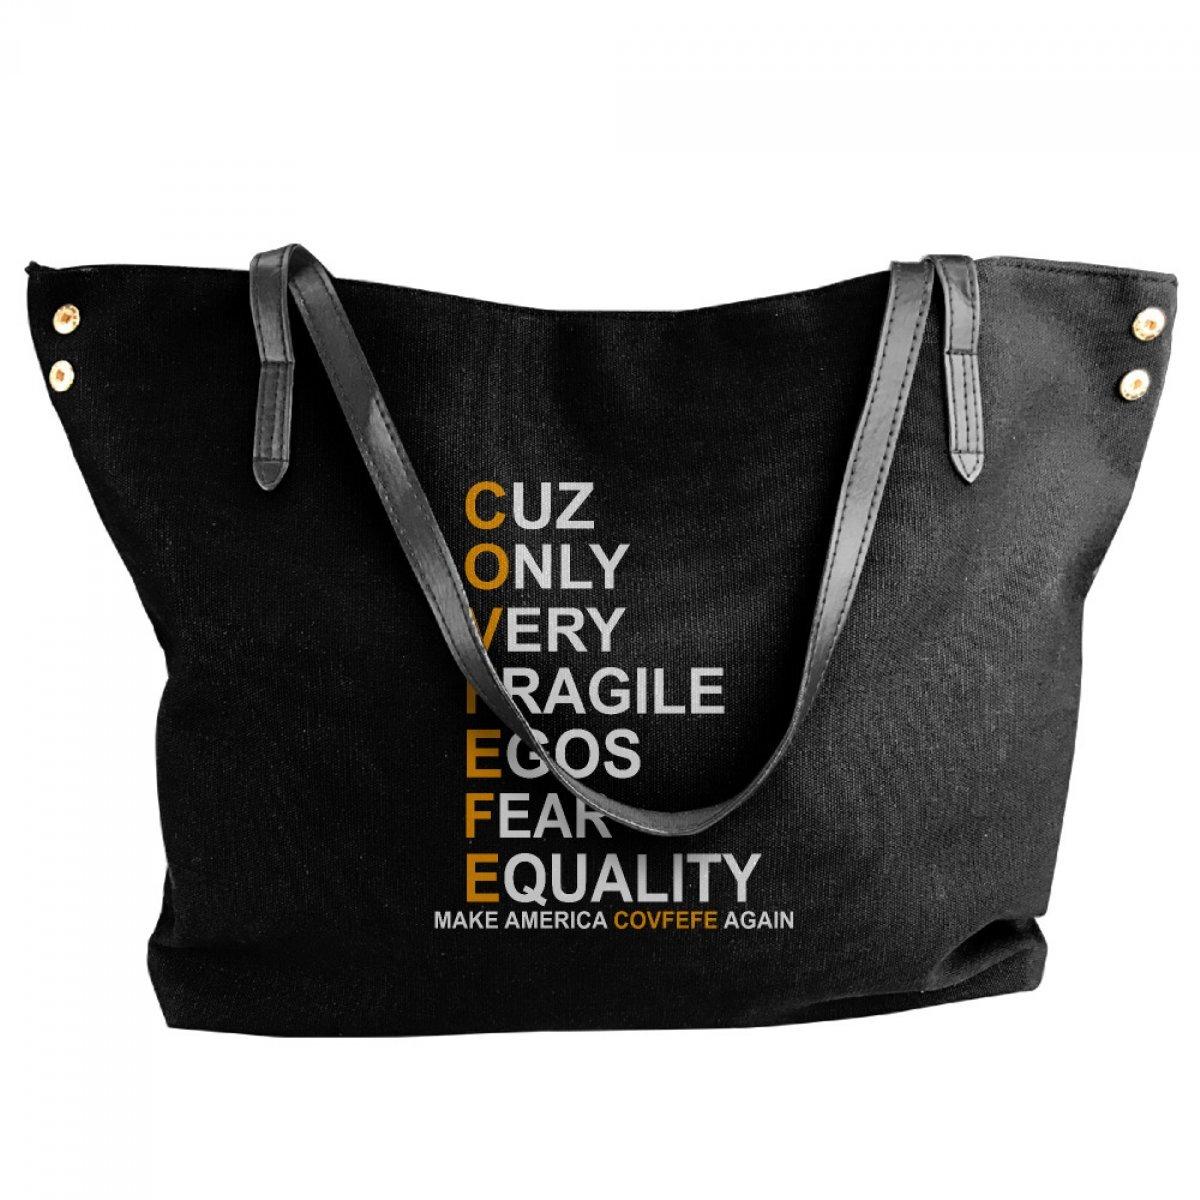 PhoRock Women's Canvas Shoulder Bag COVFEFE Hotspot Style Pattern Black Shopping Handbags FDRA005 0